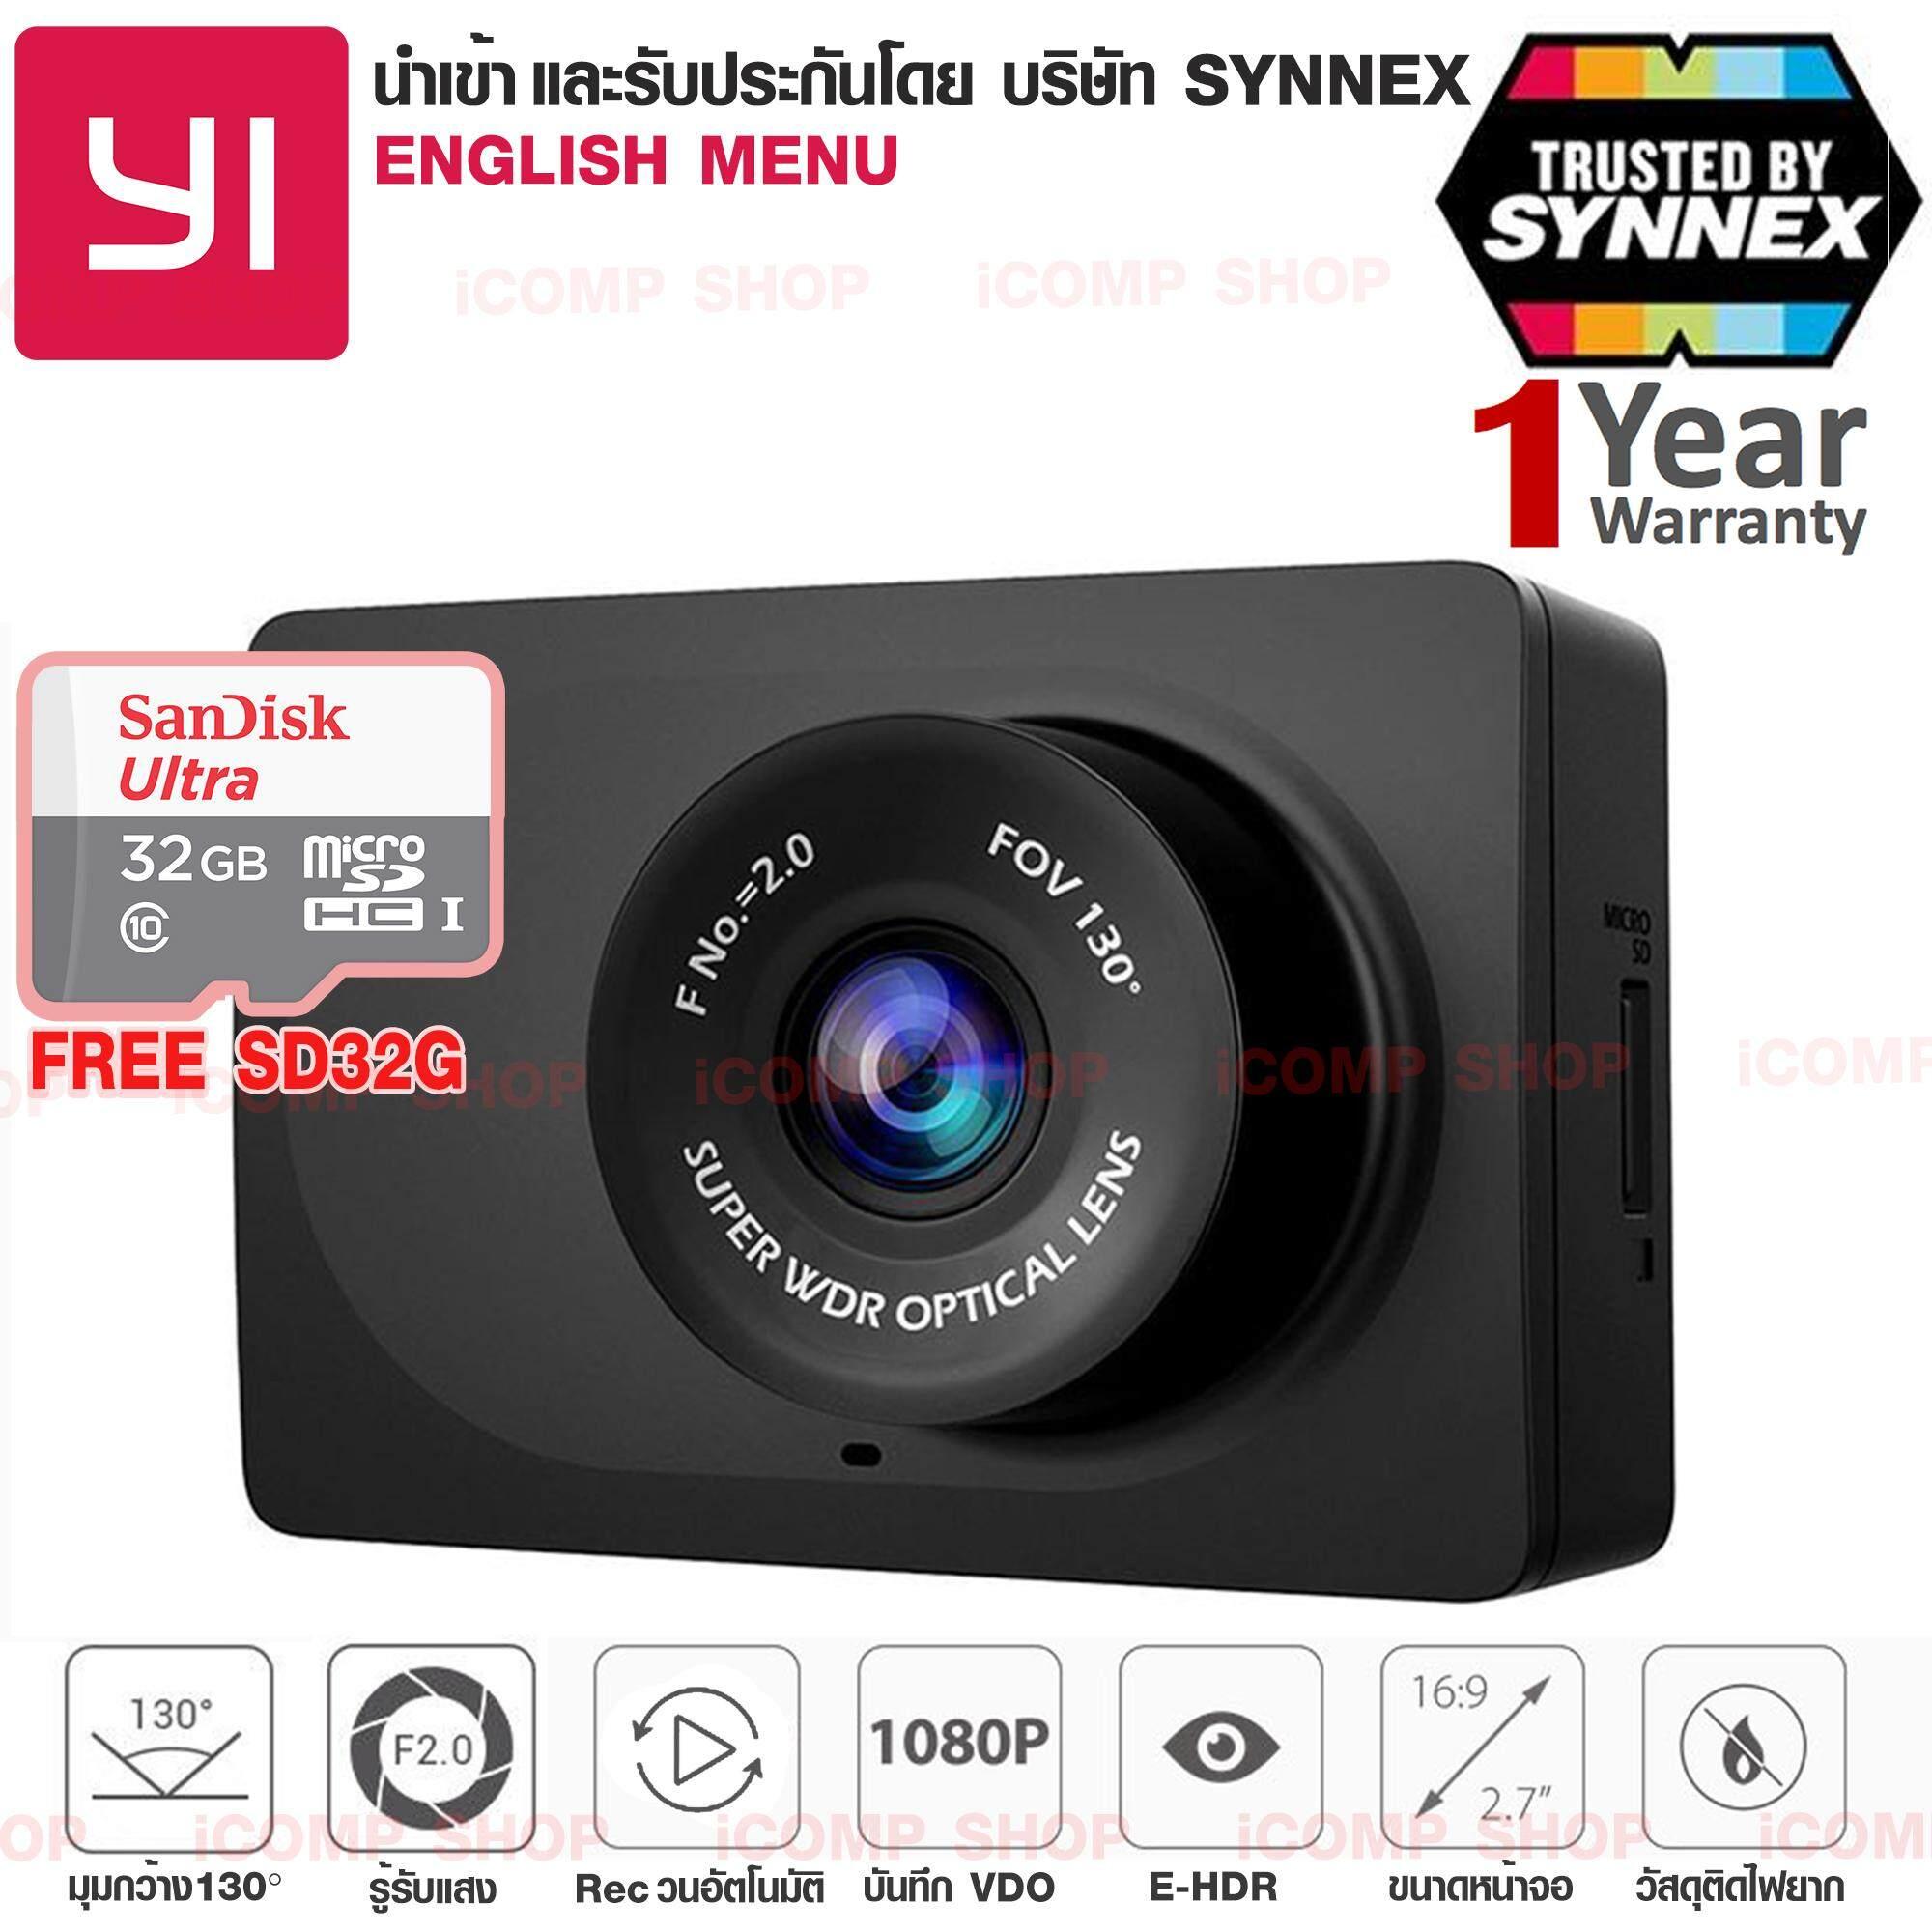 Xiaomi Yi Dash Cam 130° กล้องติดรถยนต์ 1080P Wi-Fi+ Sandisk MicroSD 32GB (ประกัน SYNNEX)  - 123dd8ae75ea1676178f90a61a446b88 - 🚐[฿119,000]อีซูซุดราก้อนปี 1998 SLX สวยสภาพดี พร้อมโอน เอกสารครบ